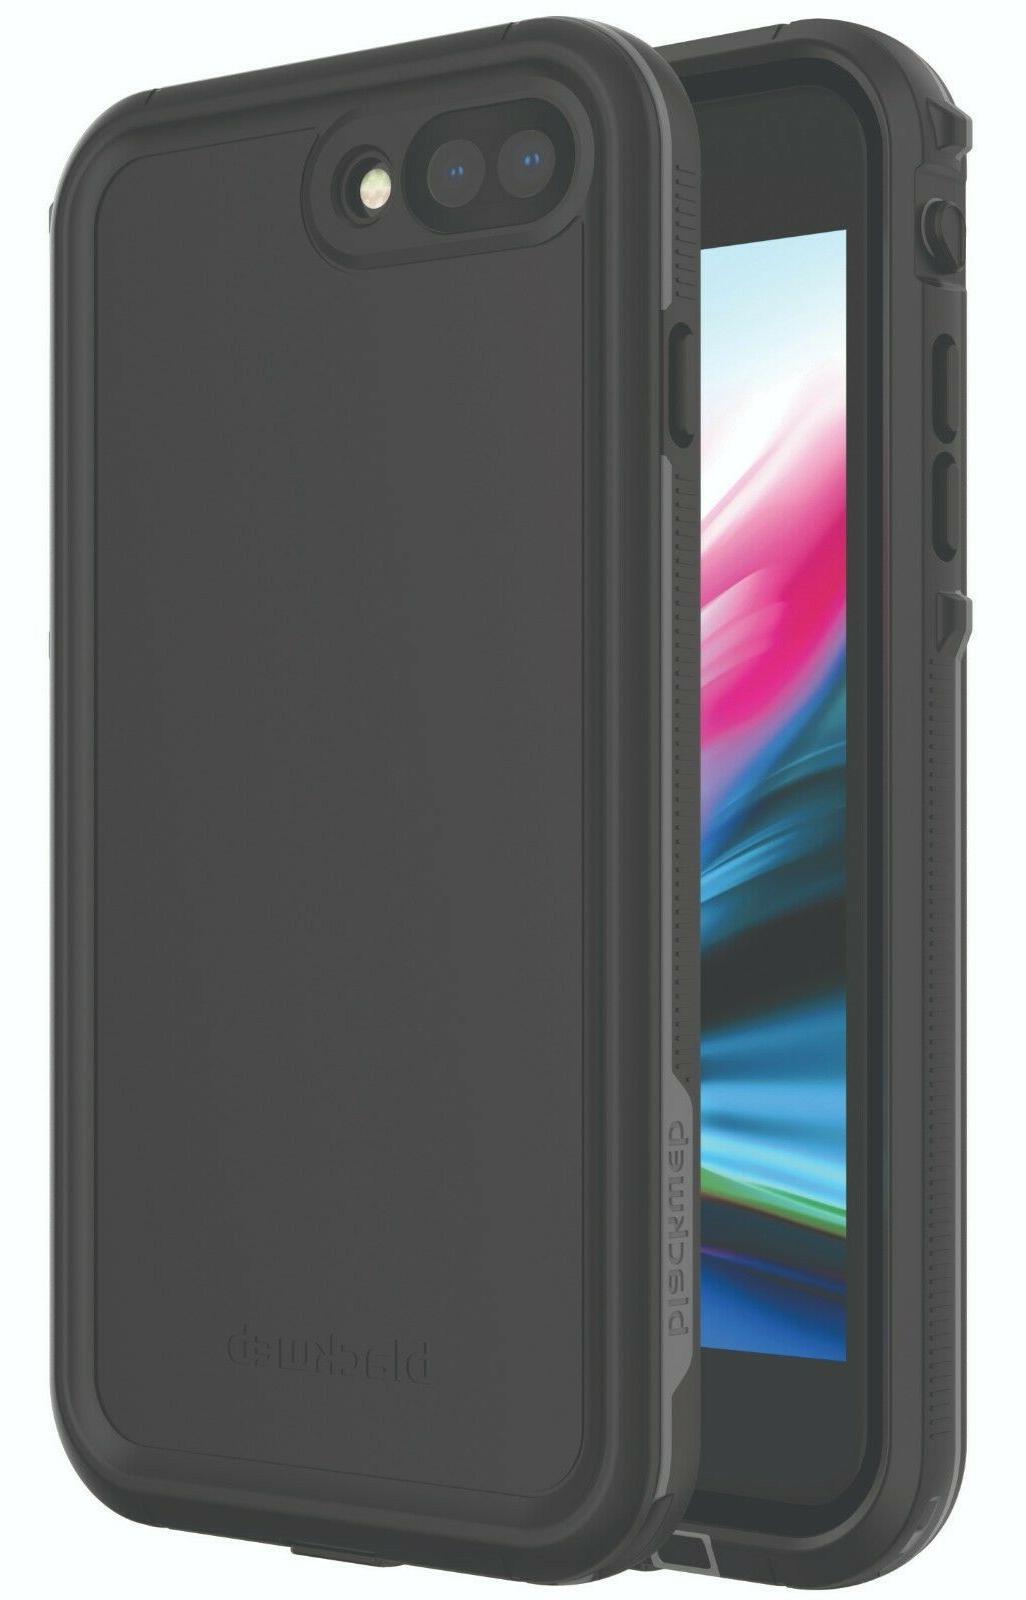 Blackweb Waterproof Phone Case for iPhone 7PLUS/8 PLUS - Black